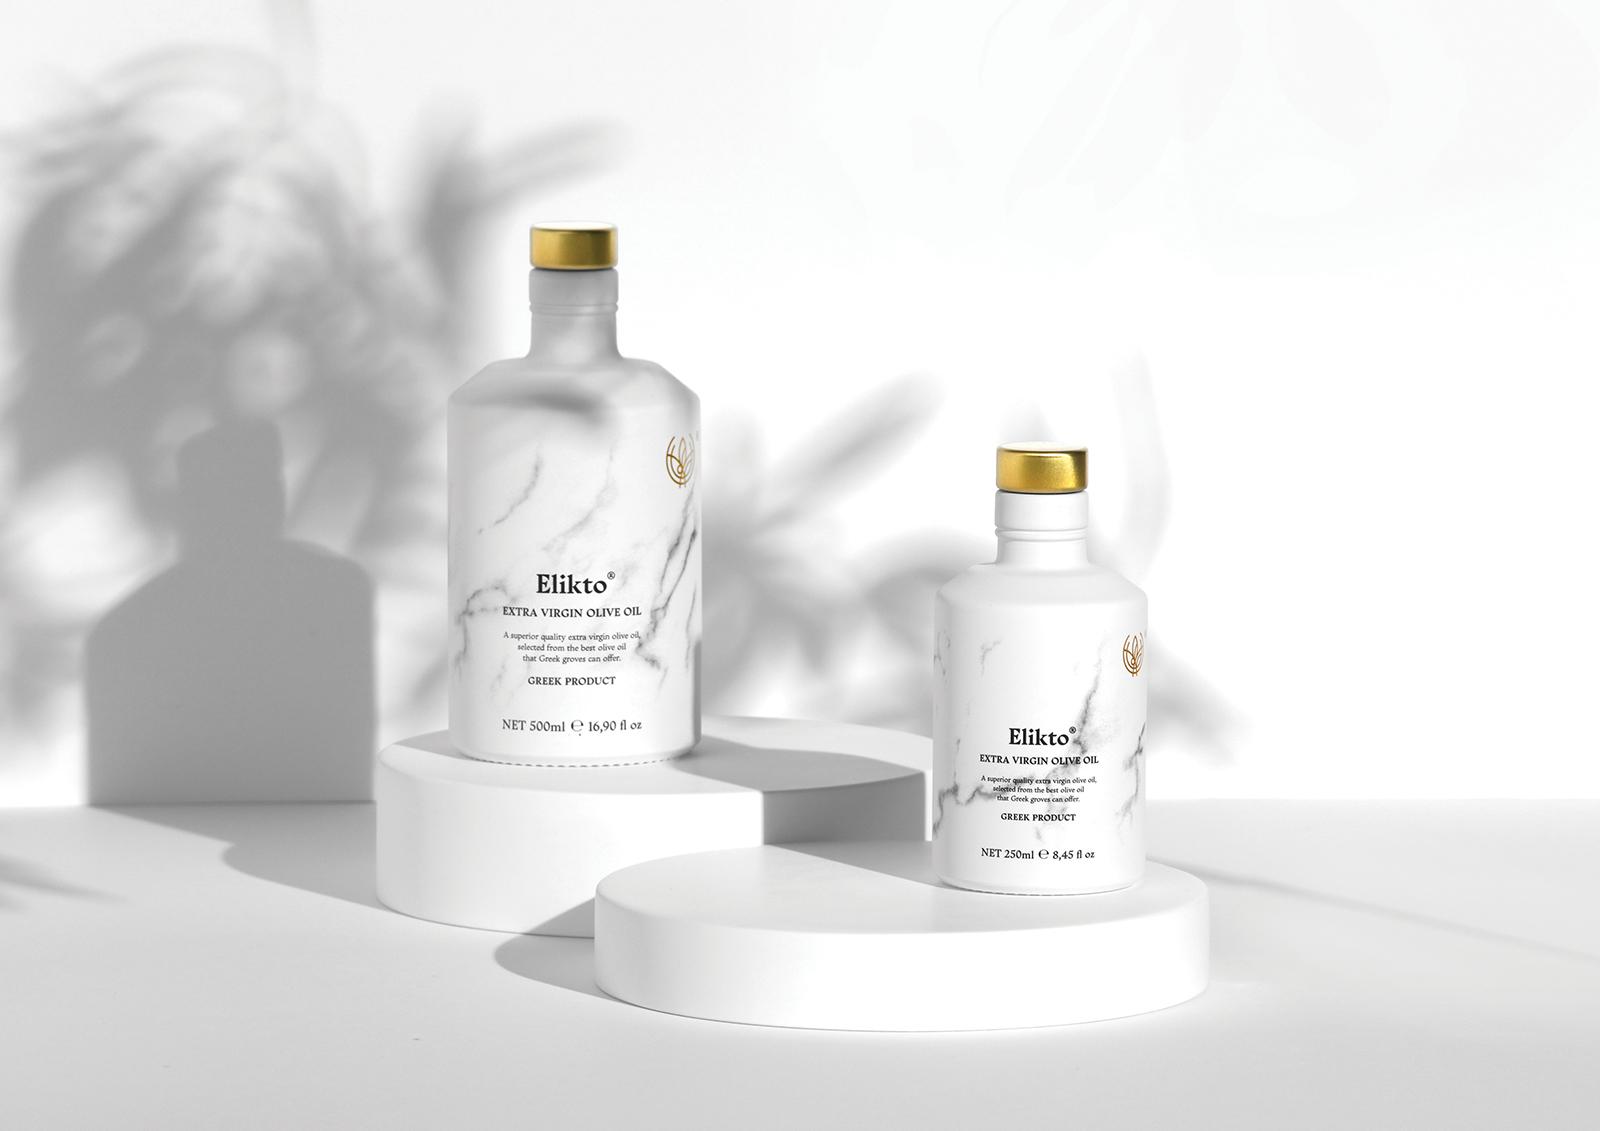 Elikto Extra Virgin Olive Oil Packaging Design Designed by Chris Trivizas